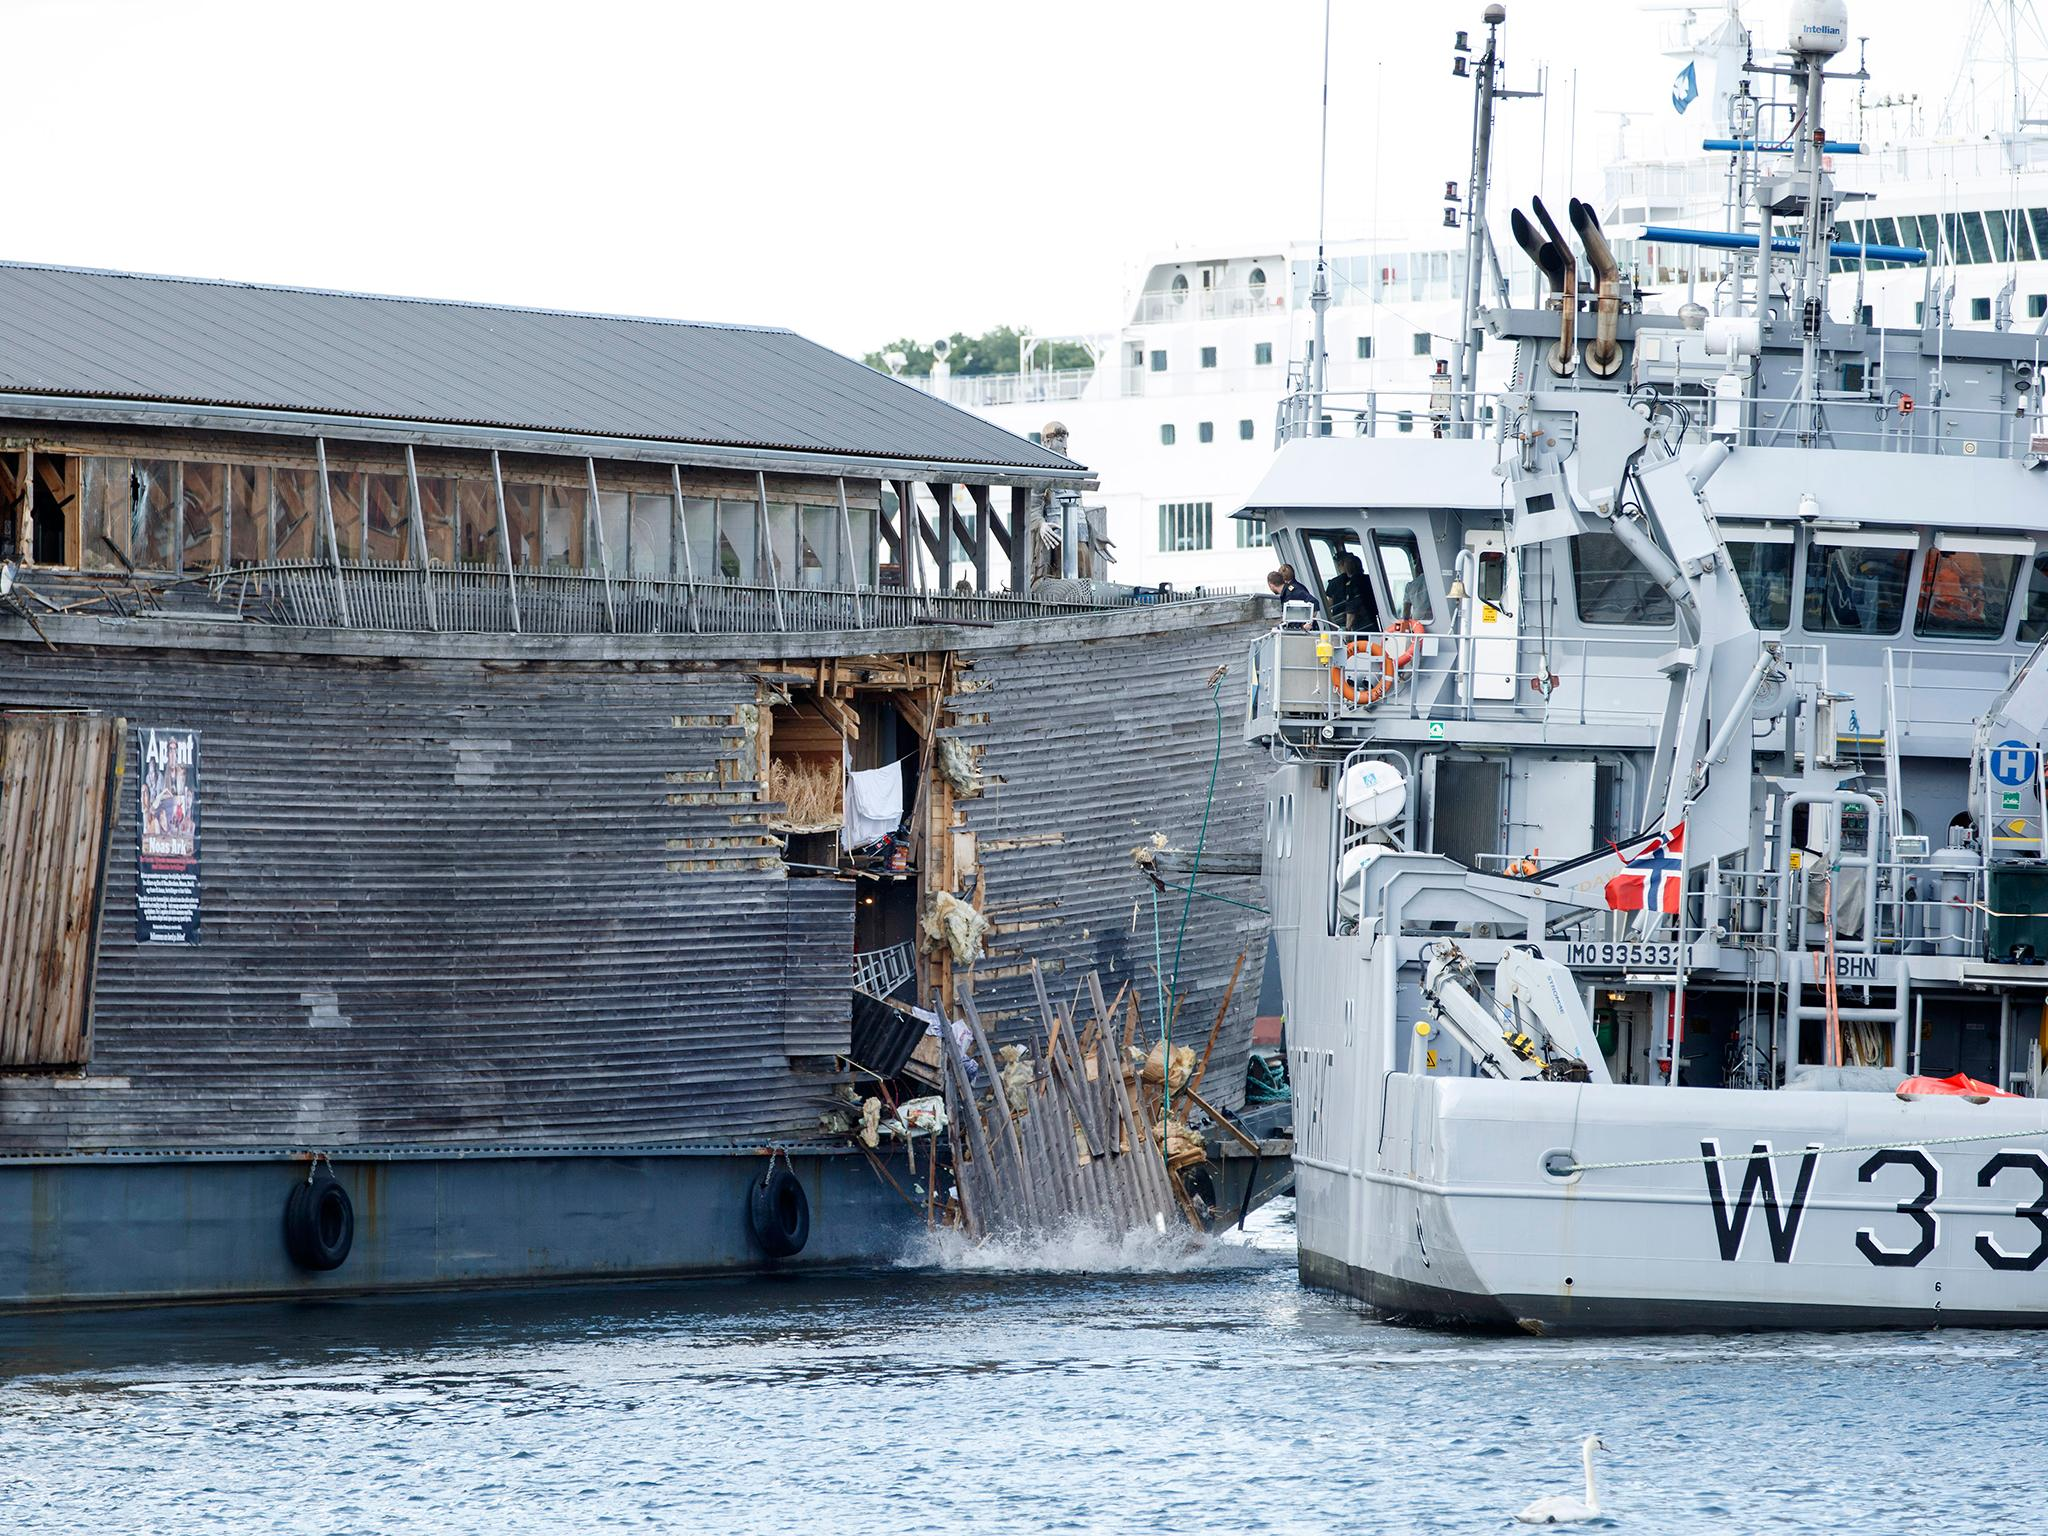 noah u0027s ark replica badly damaged after colliding with coastguard